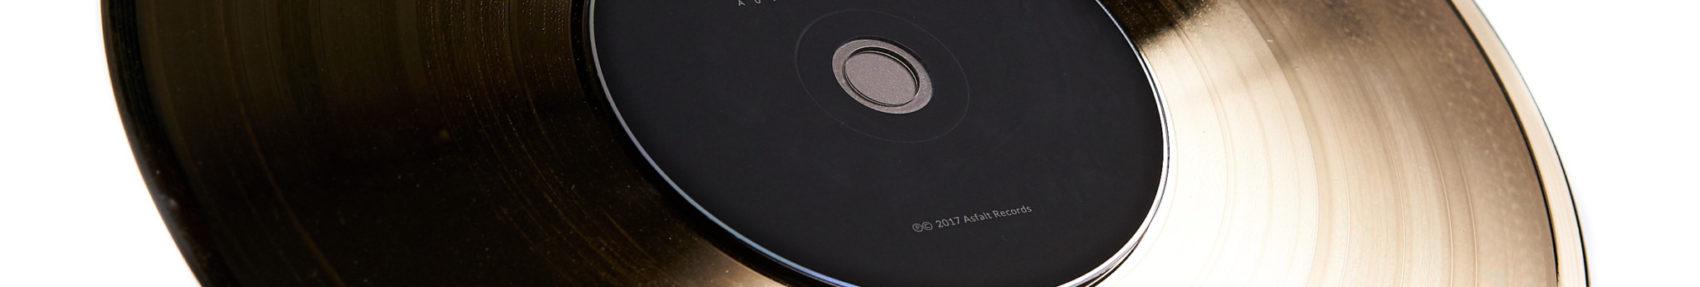 OSTR MTV Unplugged Autentycznie - Zlota Plyta